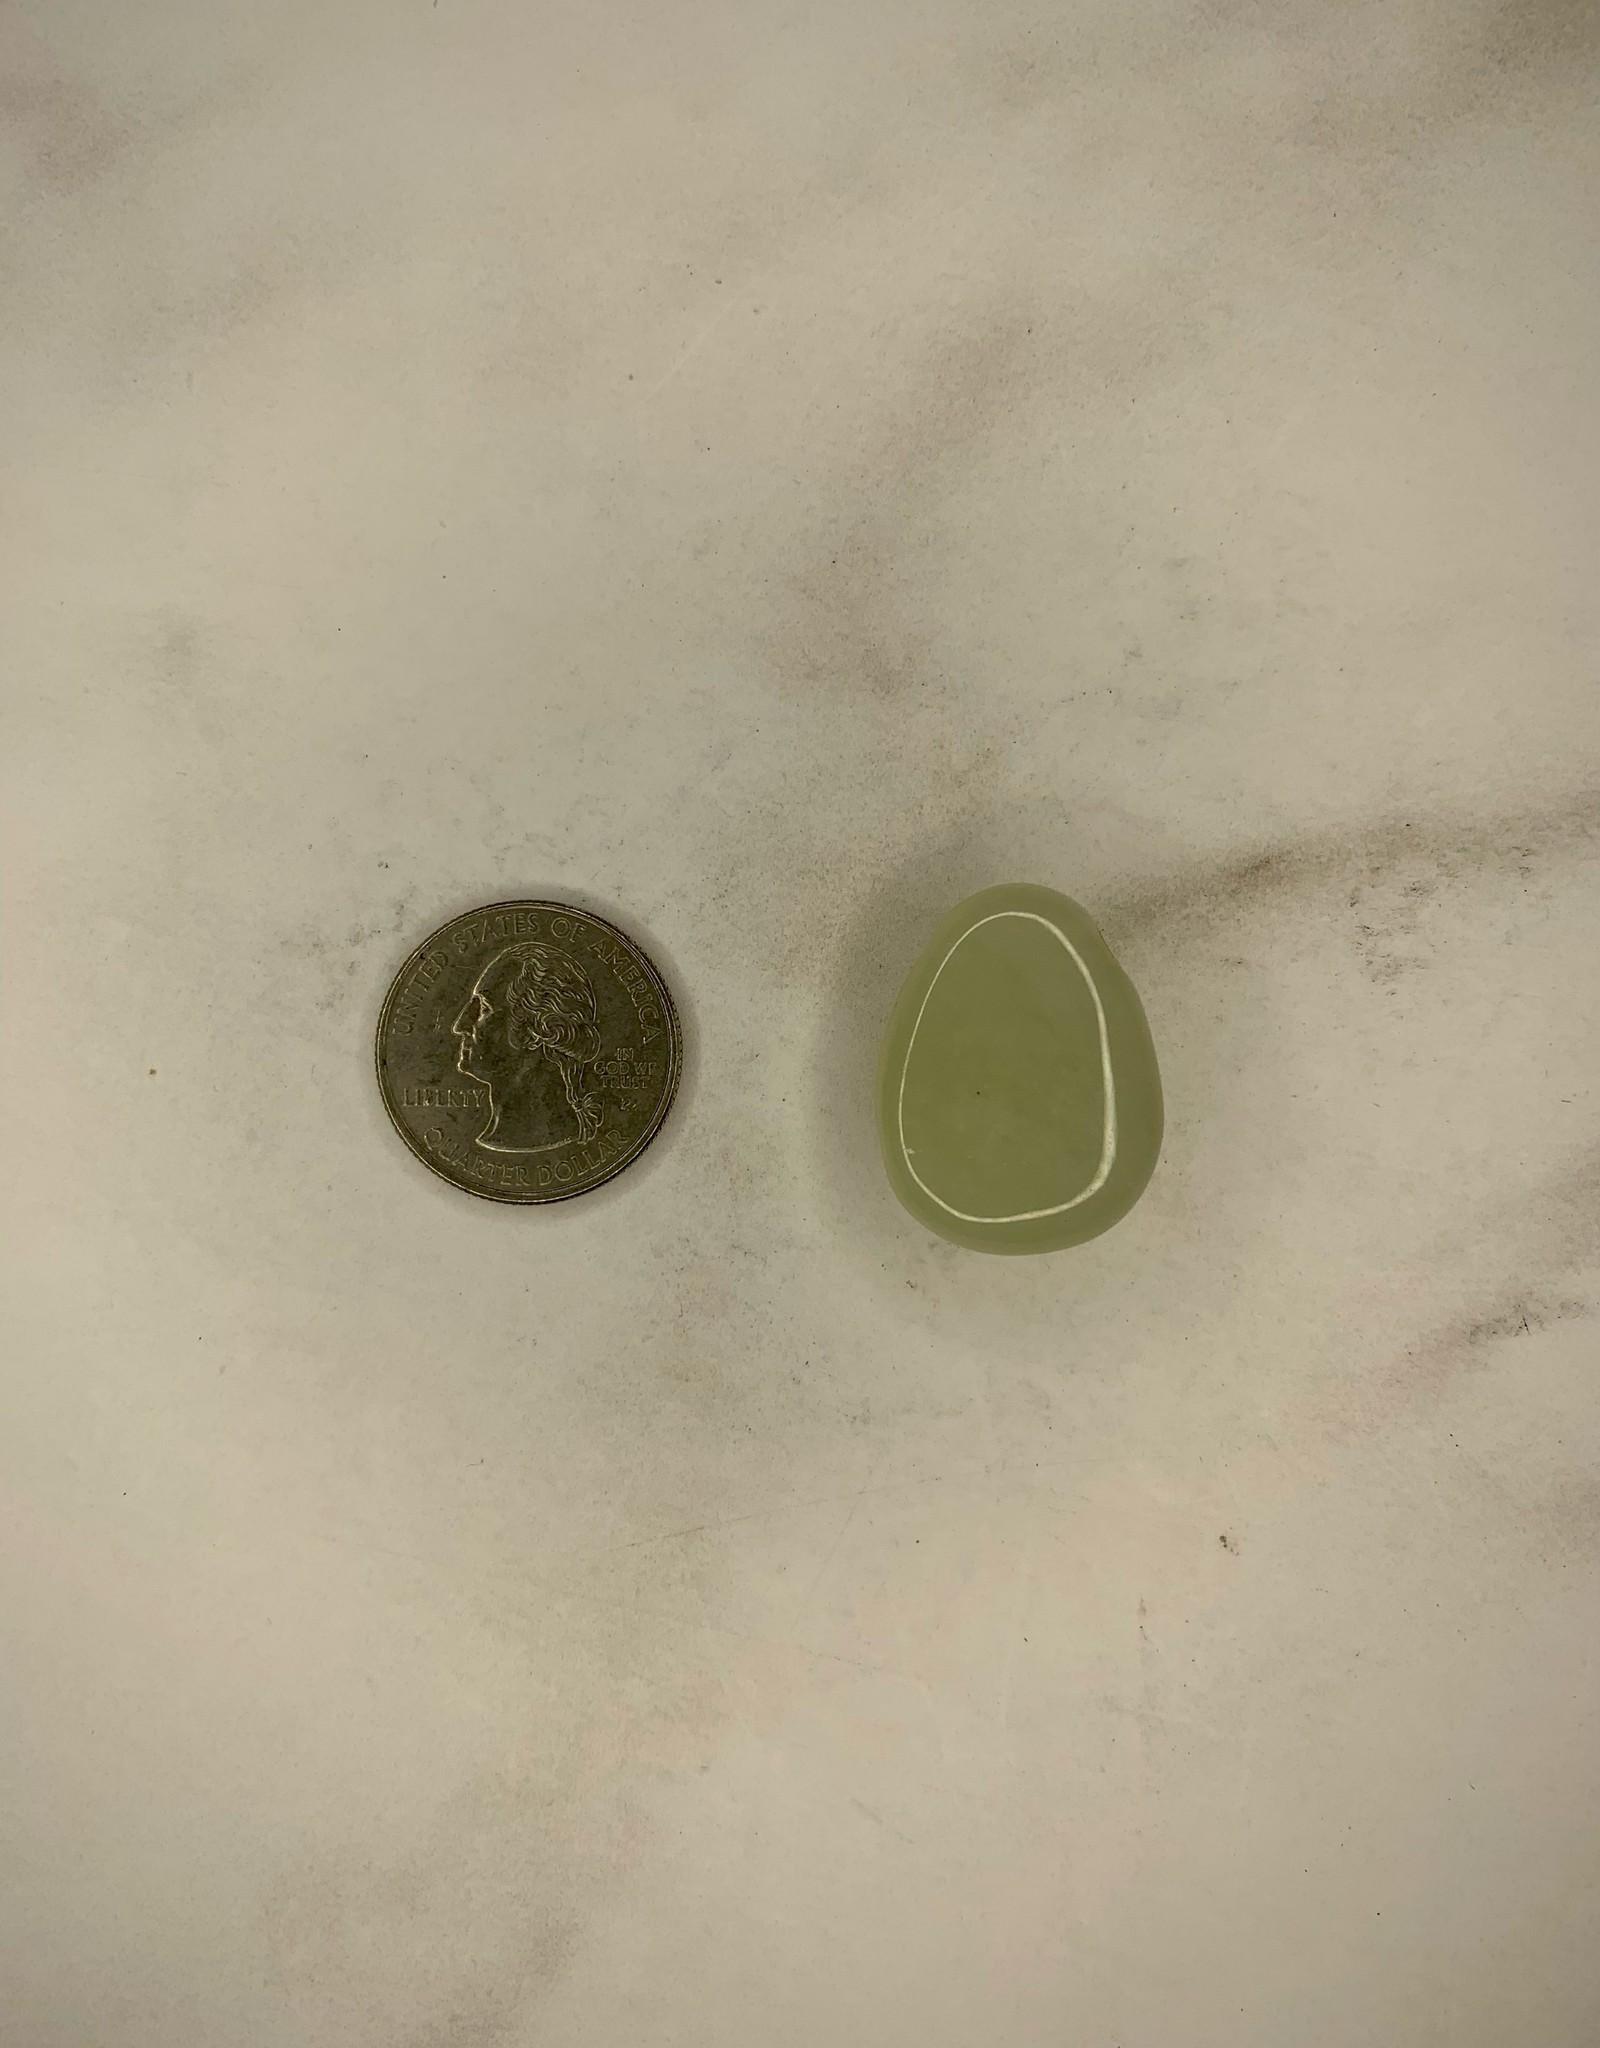 Capstone Esoterica Green Jade Gemstone Pendant